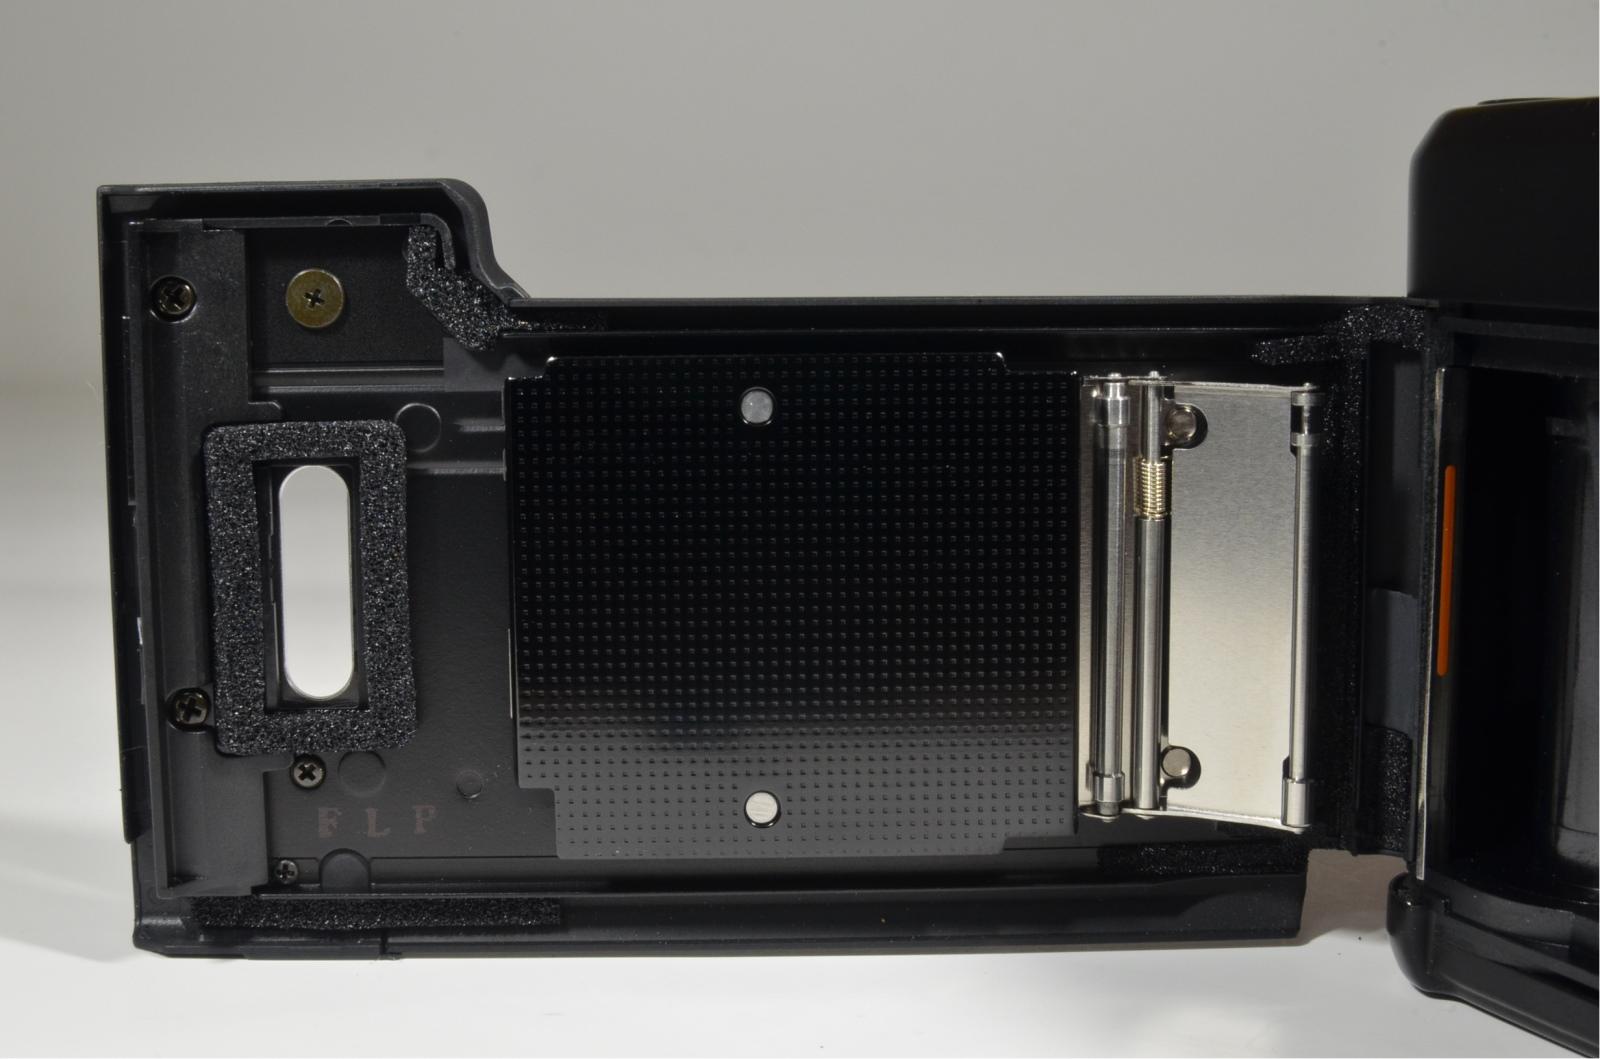 contax tvs iii black point & shoot 35mm film camera